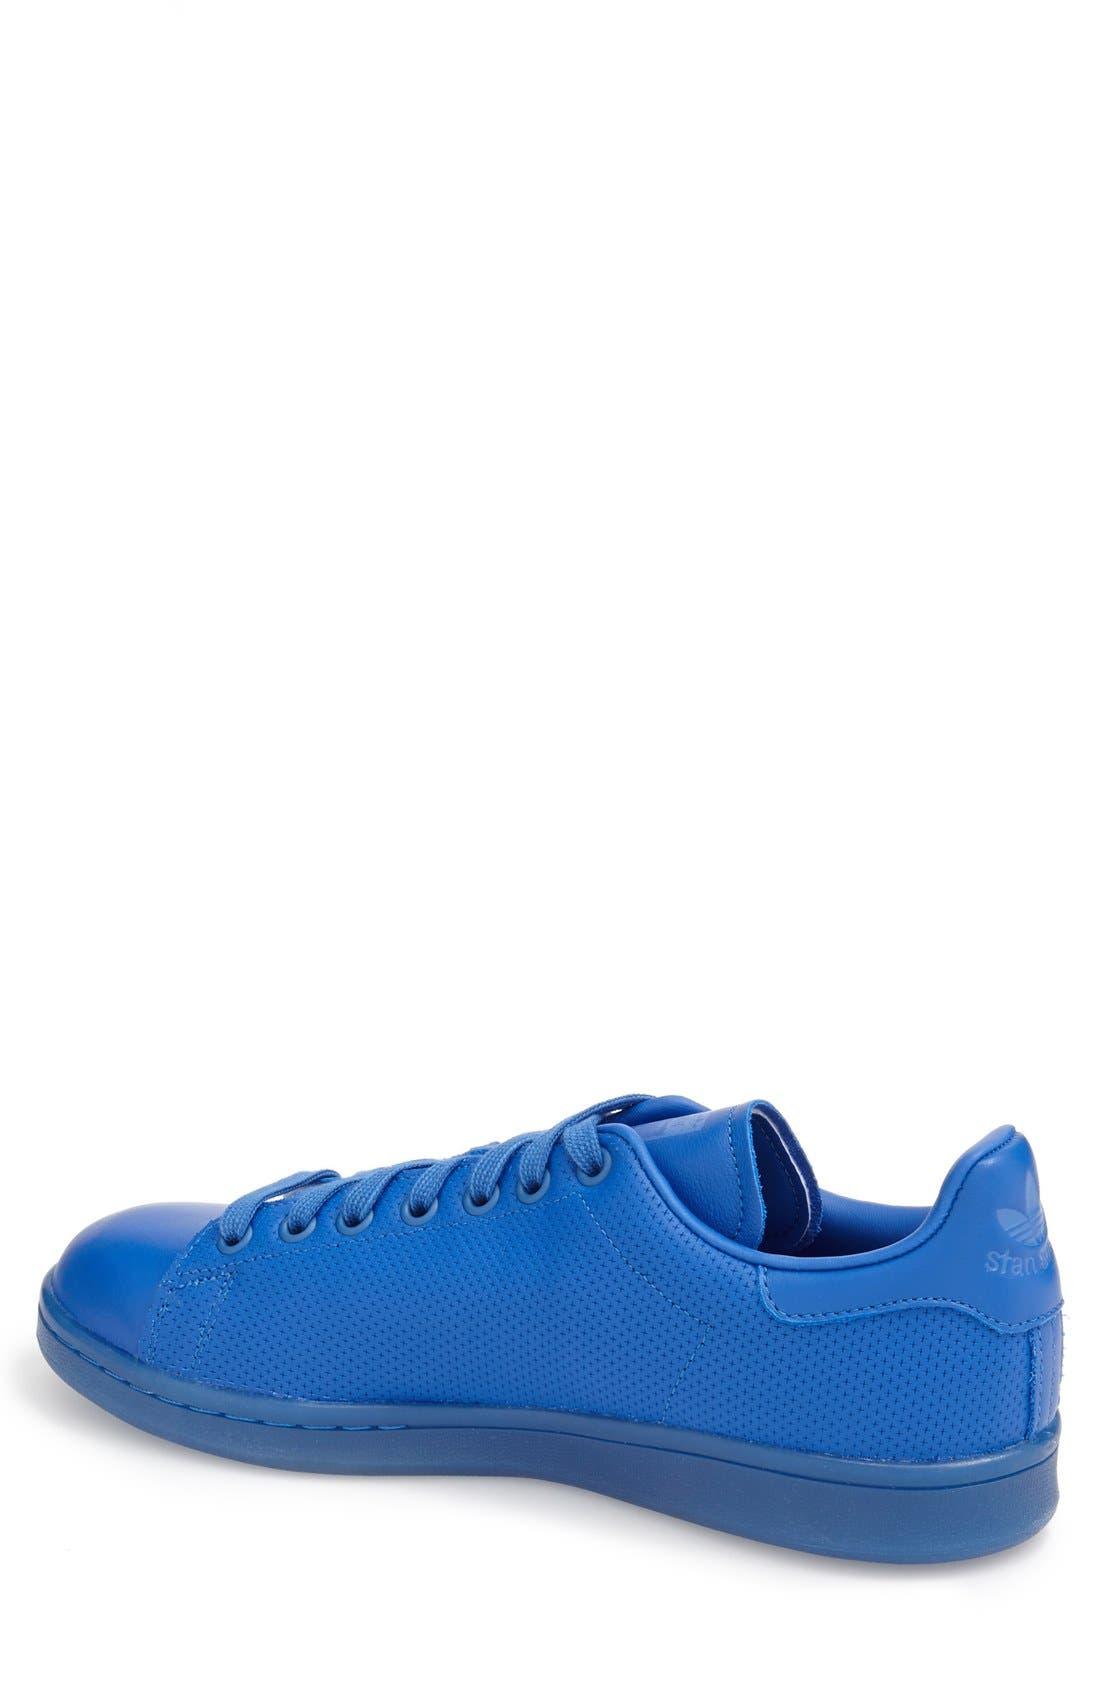 'Stan Smith' Sneaker,                             Alternate thumbnail 2, color,                             435